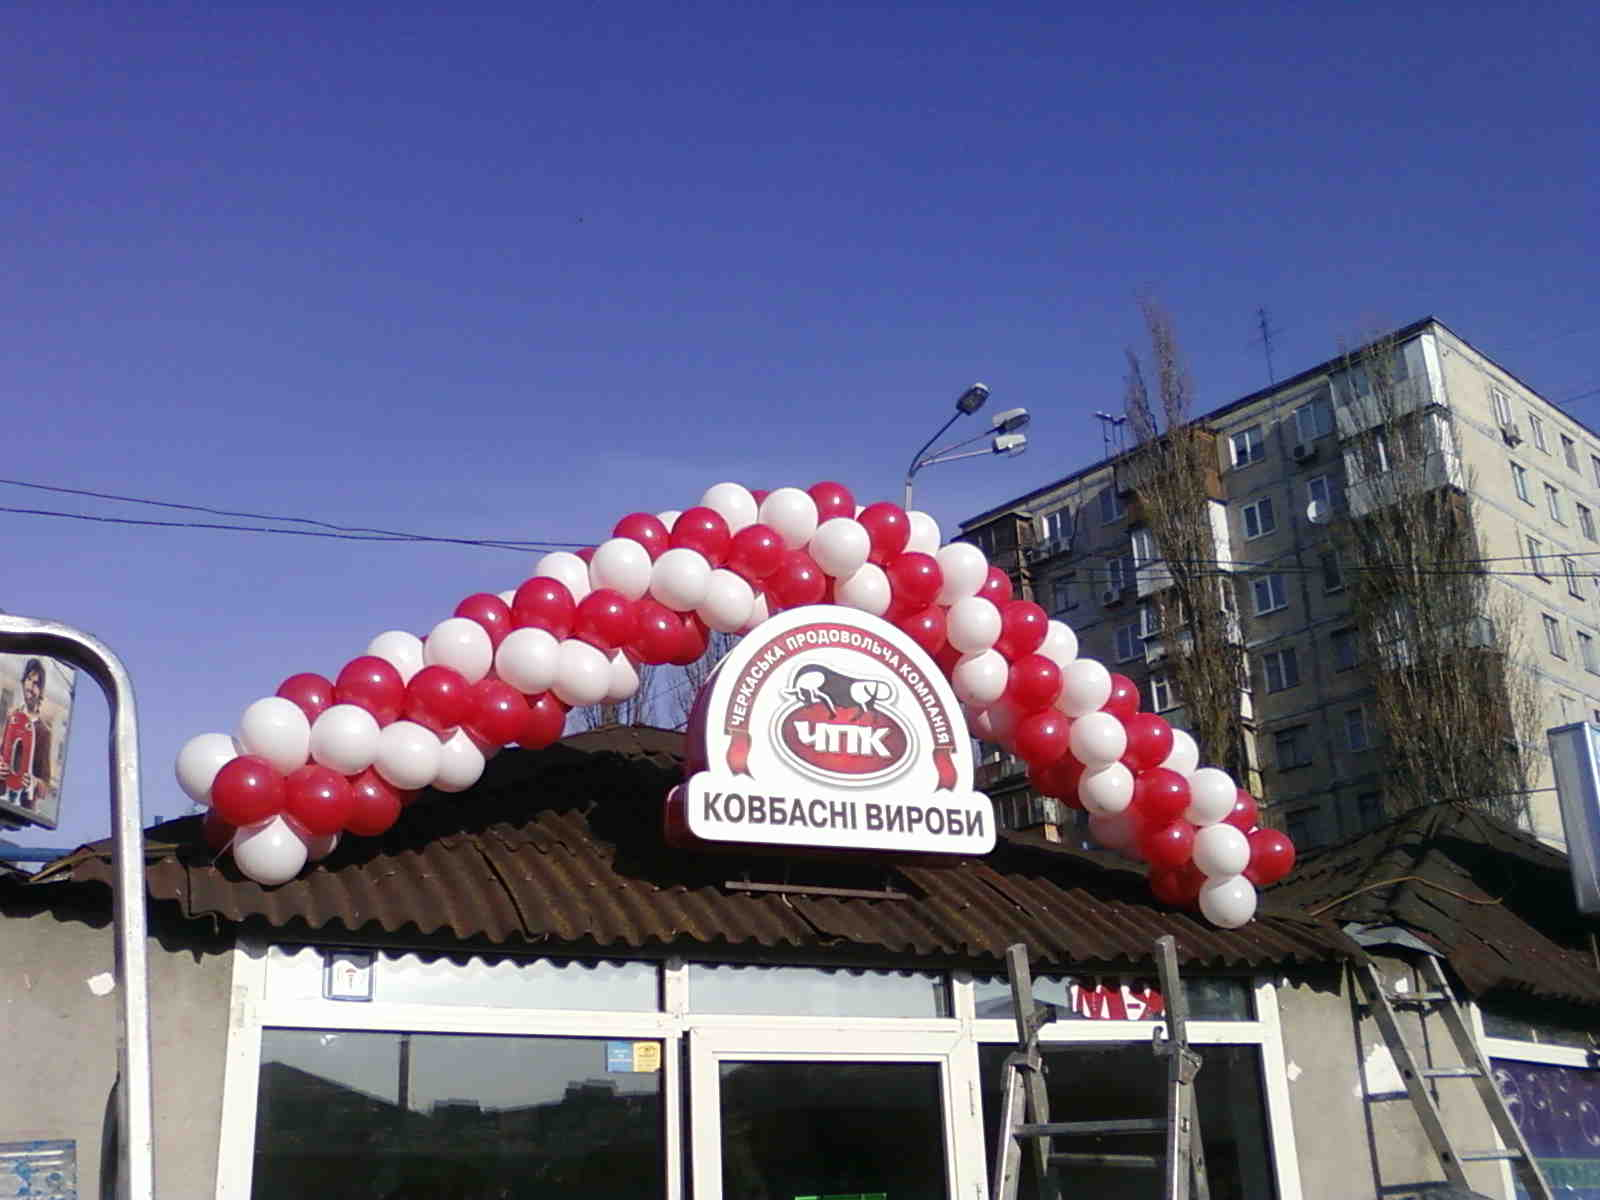 Открытие магазина. Оформление шарами фасада магазина